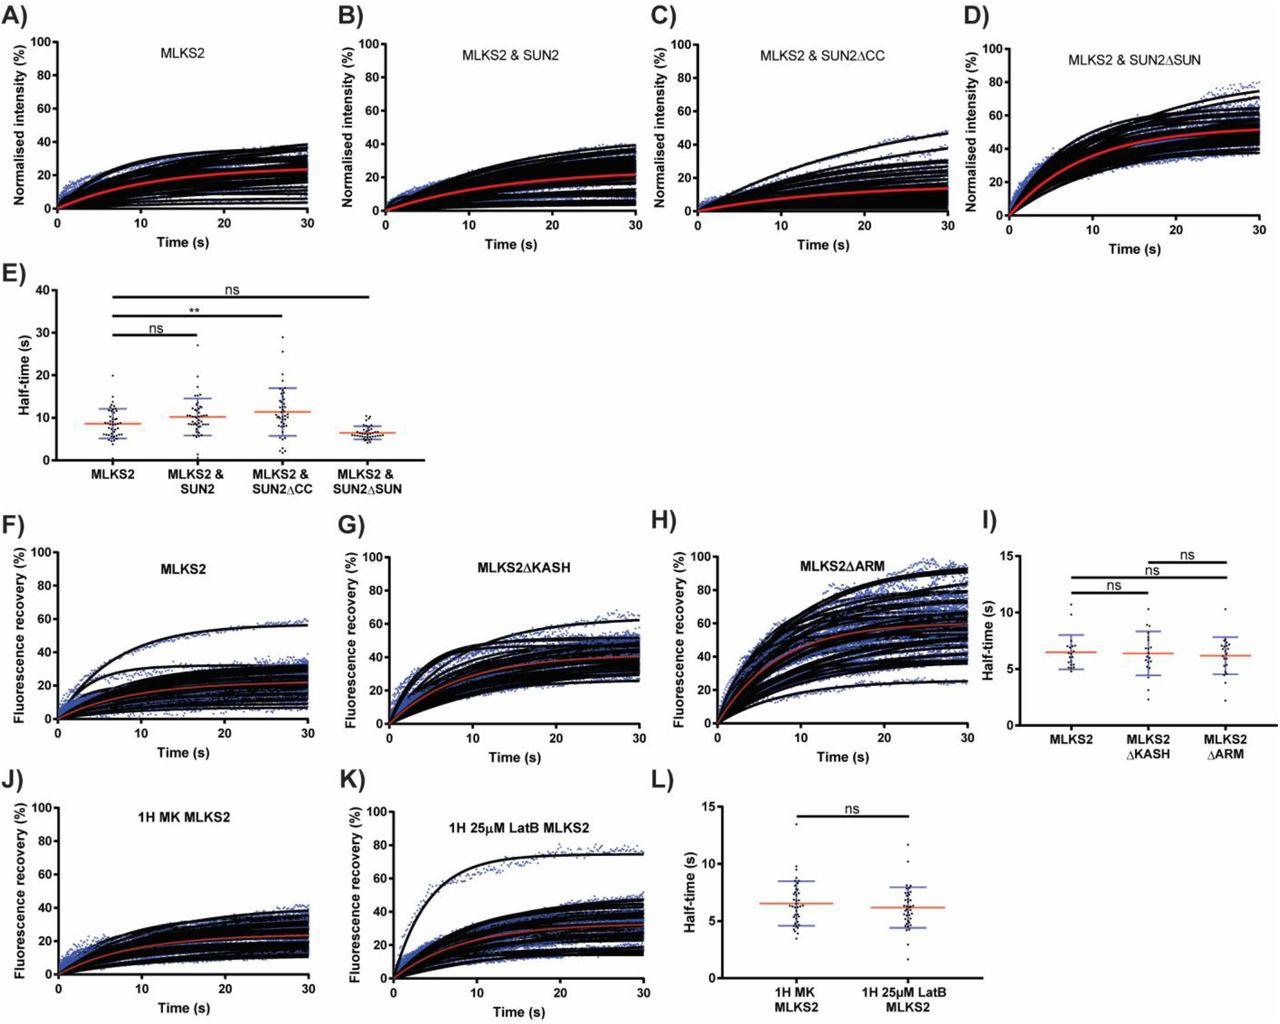 The Maize LINC KASH AtSINE-like2 (MLKS2) gene encodes an ARM